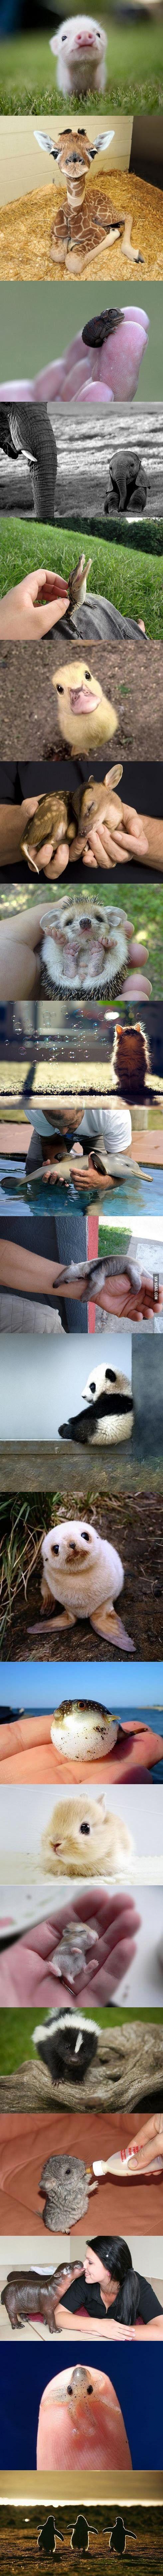 9GAG - Some cute animals